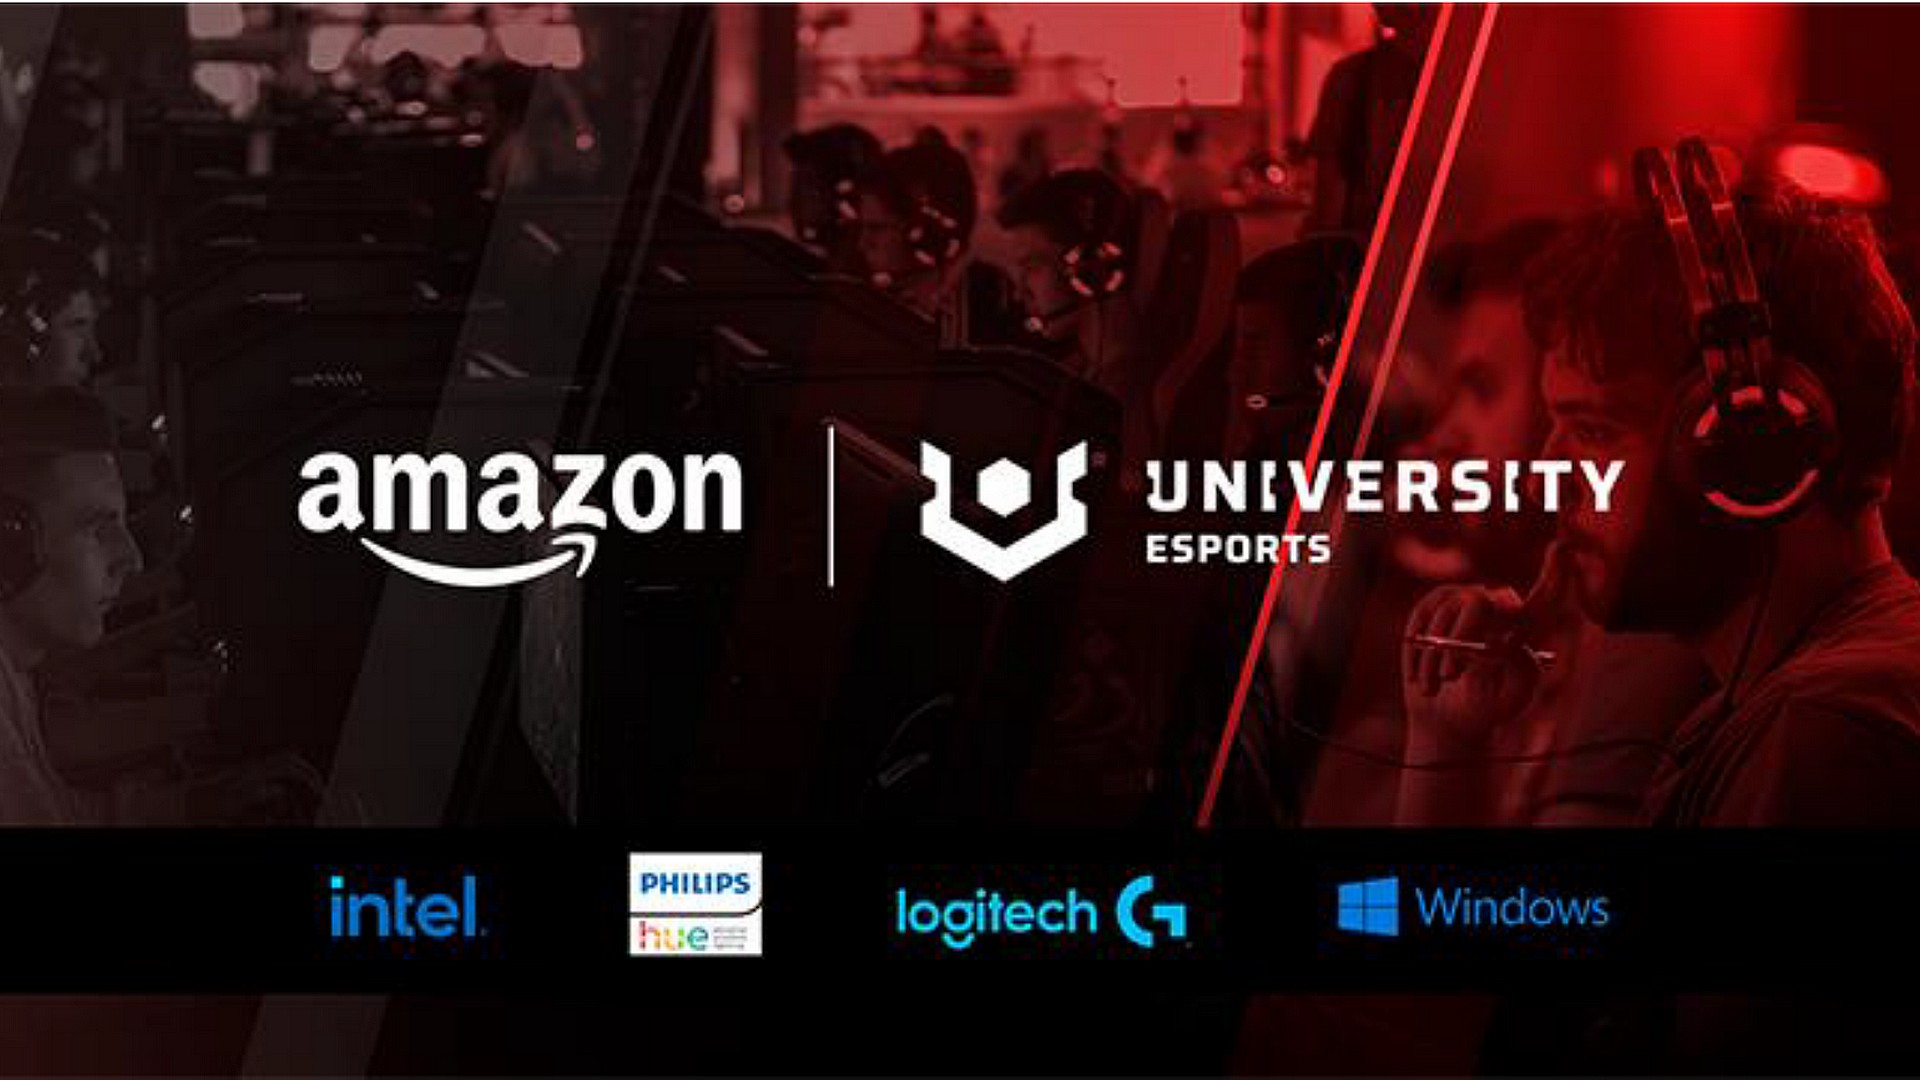 Amazon x University esports (Esport) 2021